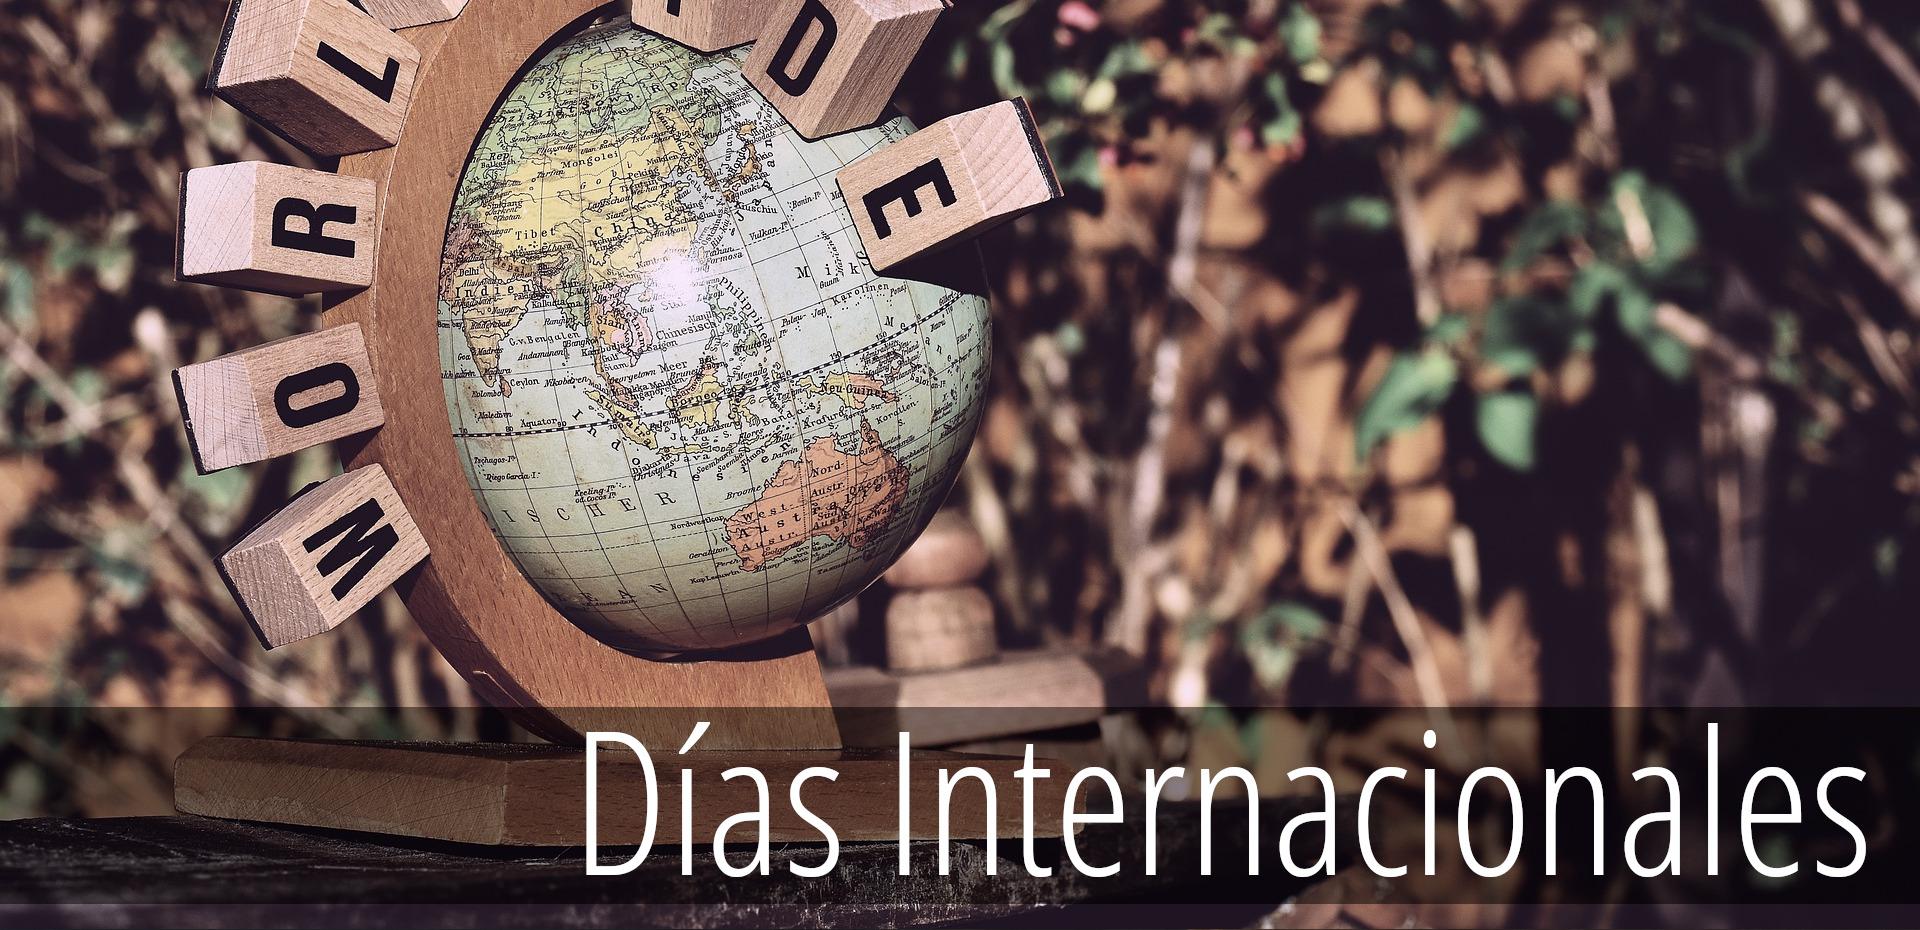 Días Internacionales con carácter social